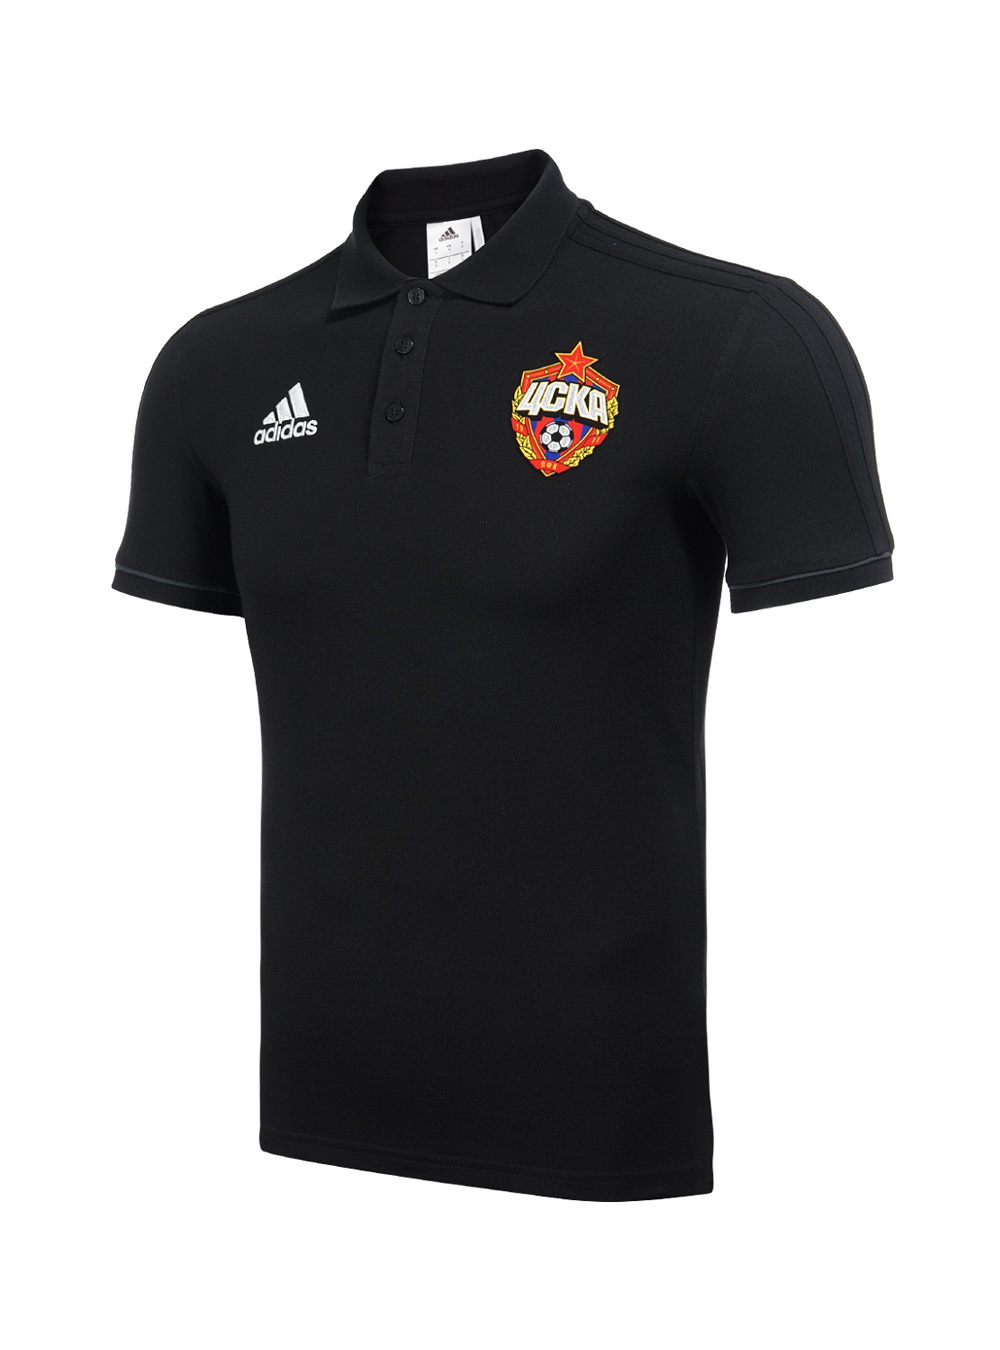 Футболка-поло (XL)Экипировка 2017/2018<br>Футболка-поло<br>